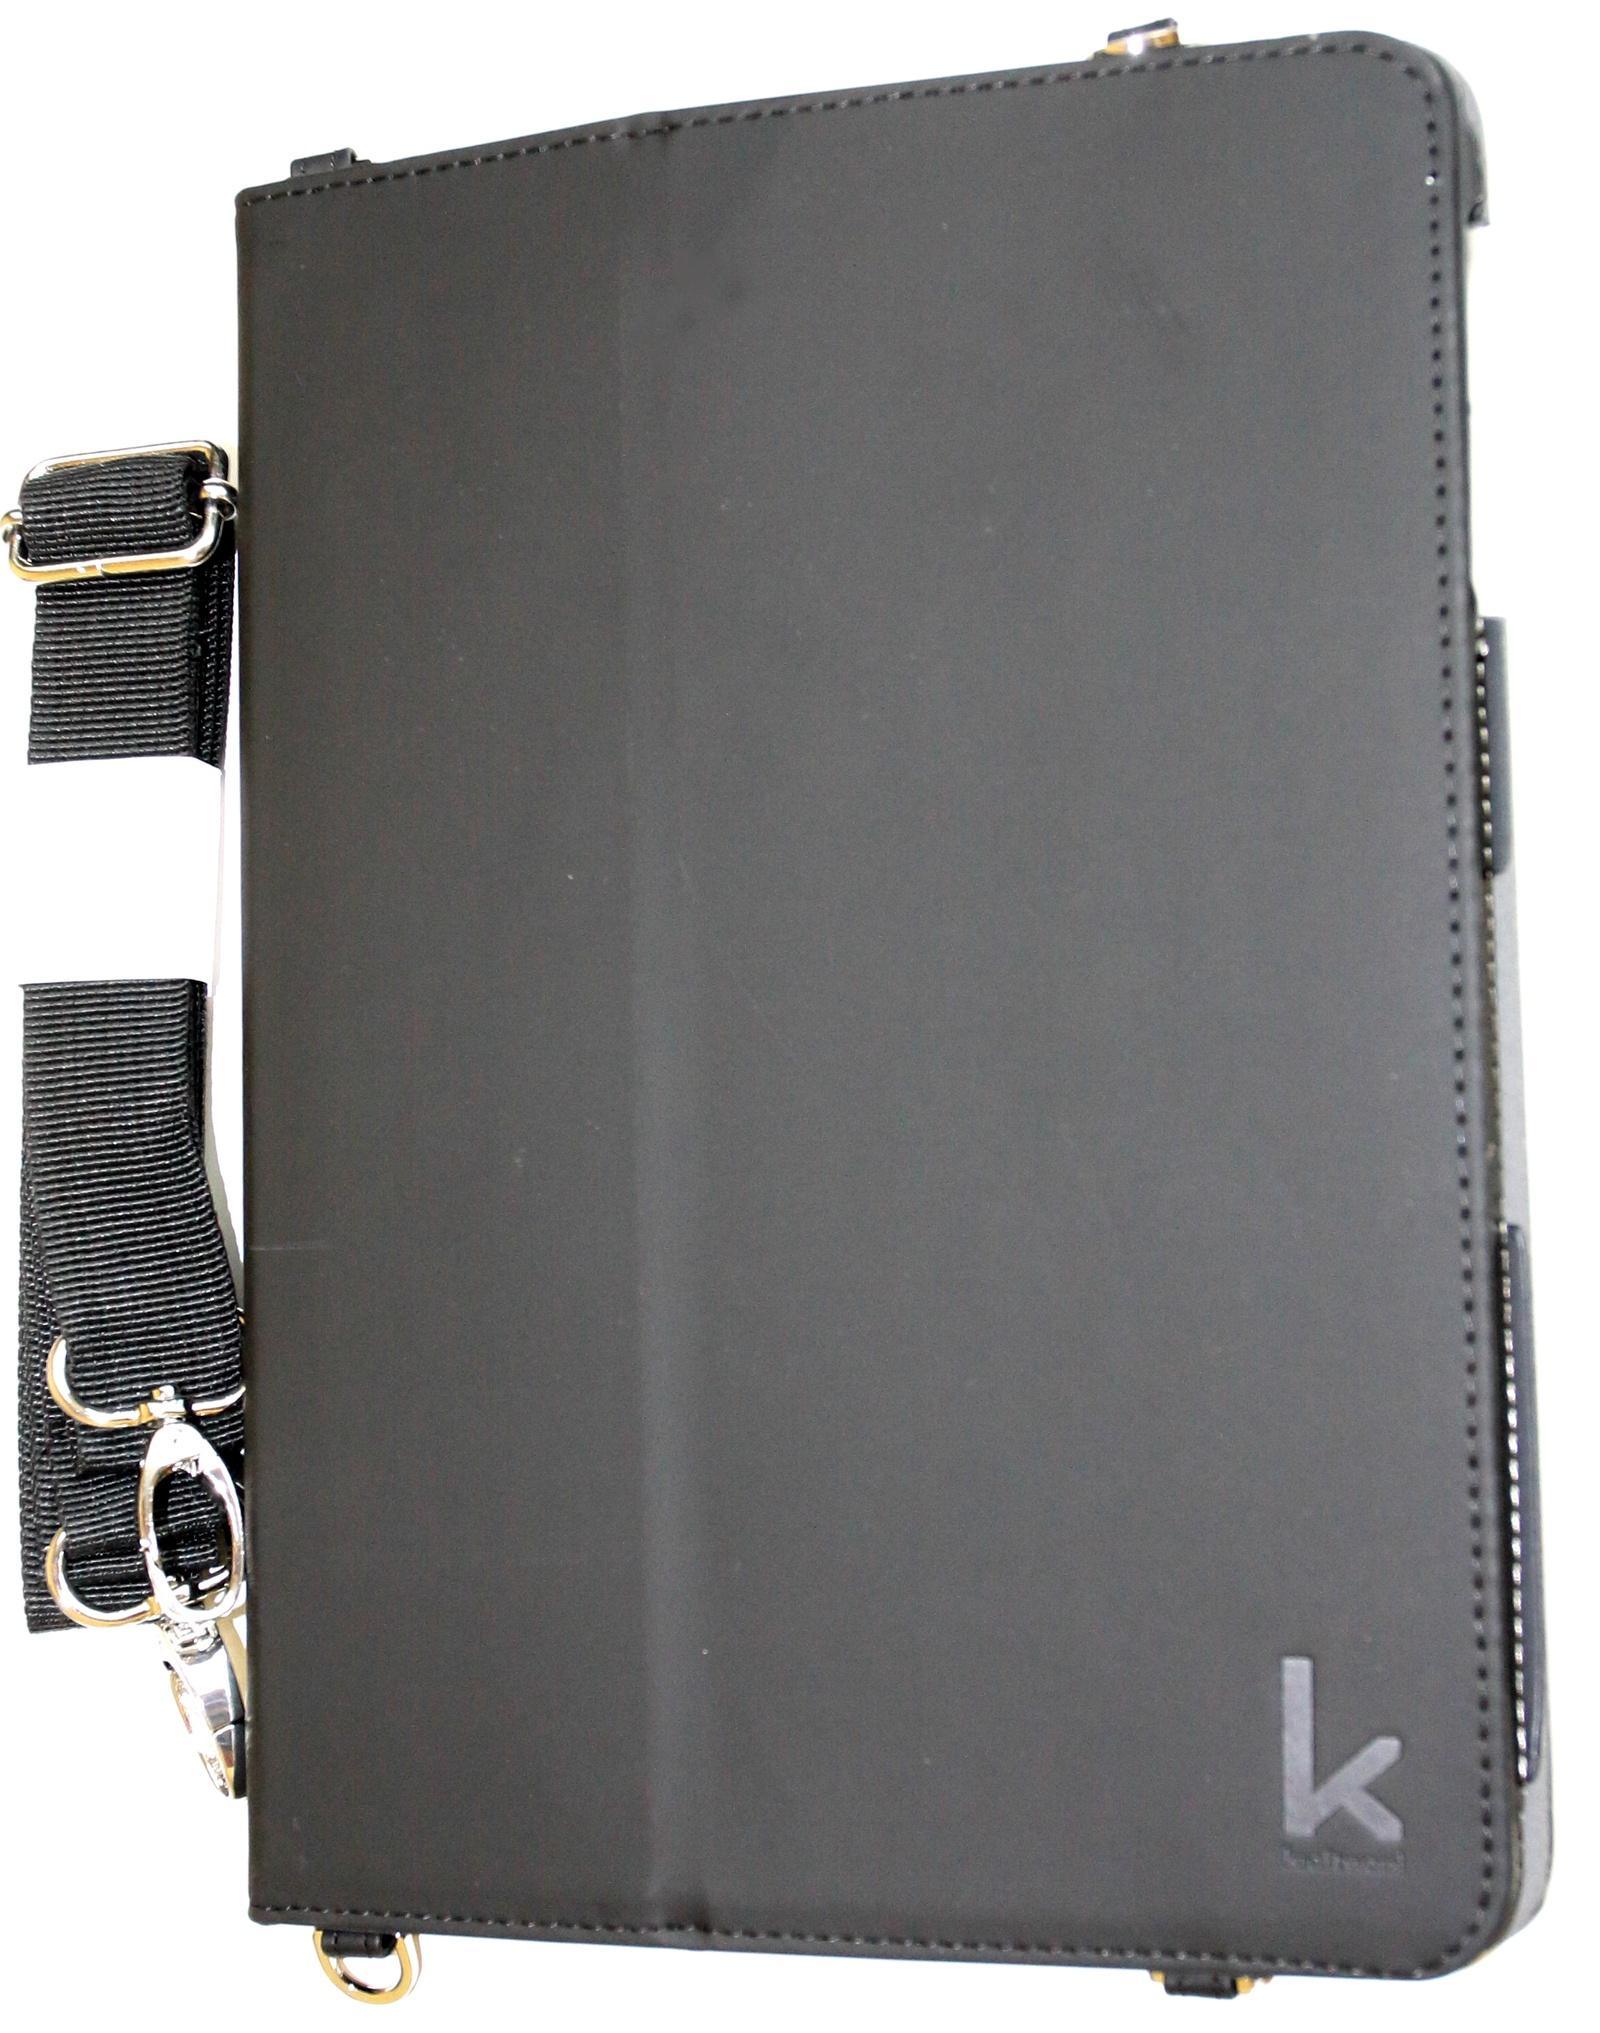 Чехол для планшета Mobilive STANDARD BASE Kraftwork для Samsung Tab S2 10,1 чехол для планшета it baggage itssgta105 1 черный для samsung galaxy tab a sm t580 t585